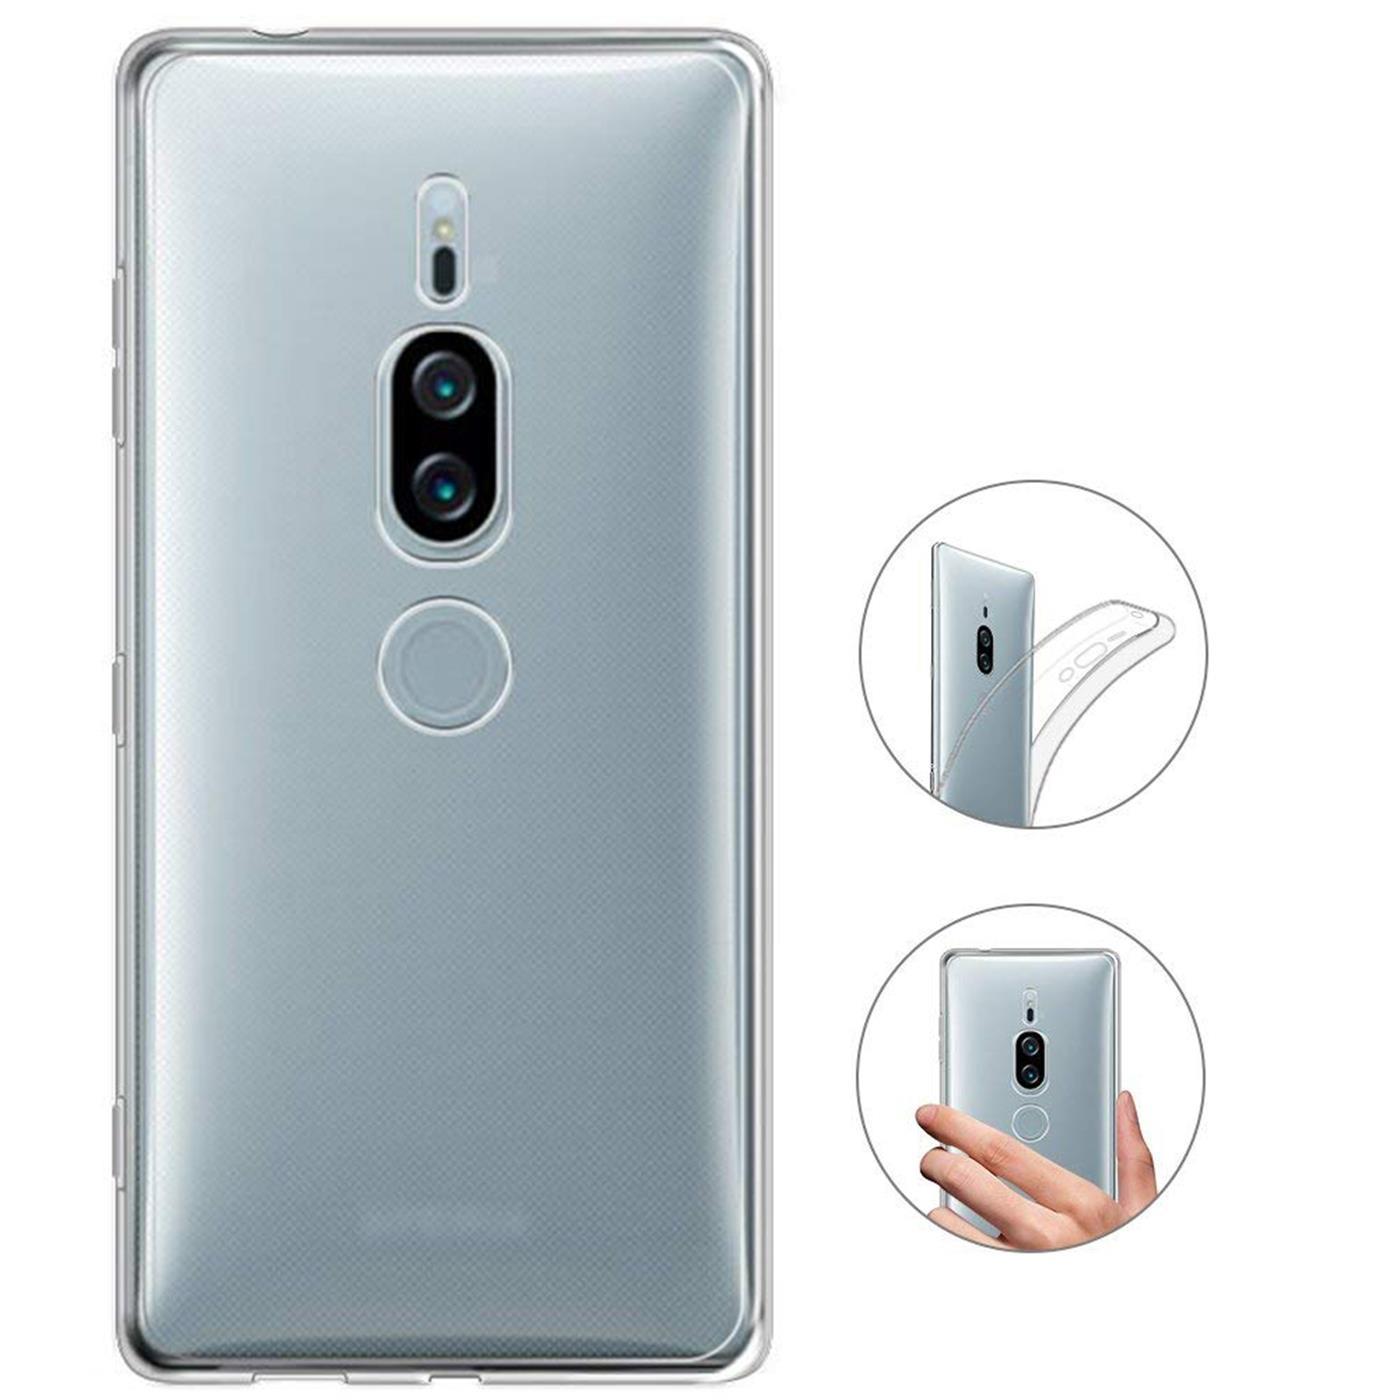 Sony-Xperia-xz2-Premium-Thin-Silikon-Klar-Case-Cover-Ultra-Slim-Stossfeste-Gel Indexbild 10